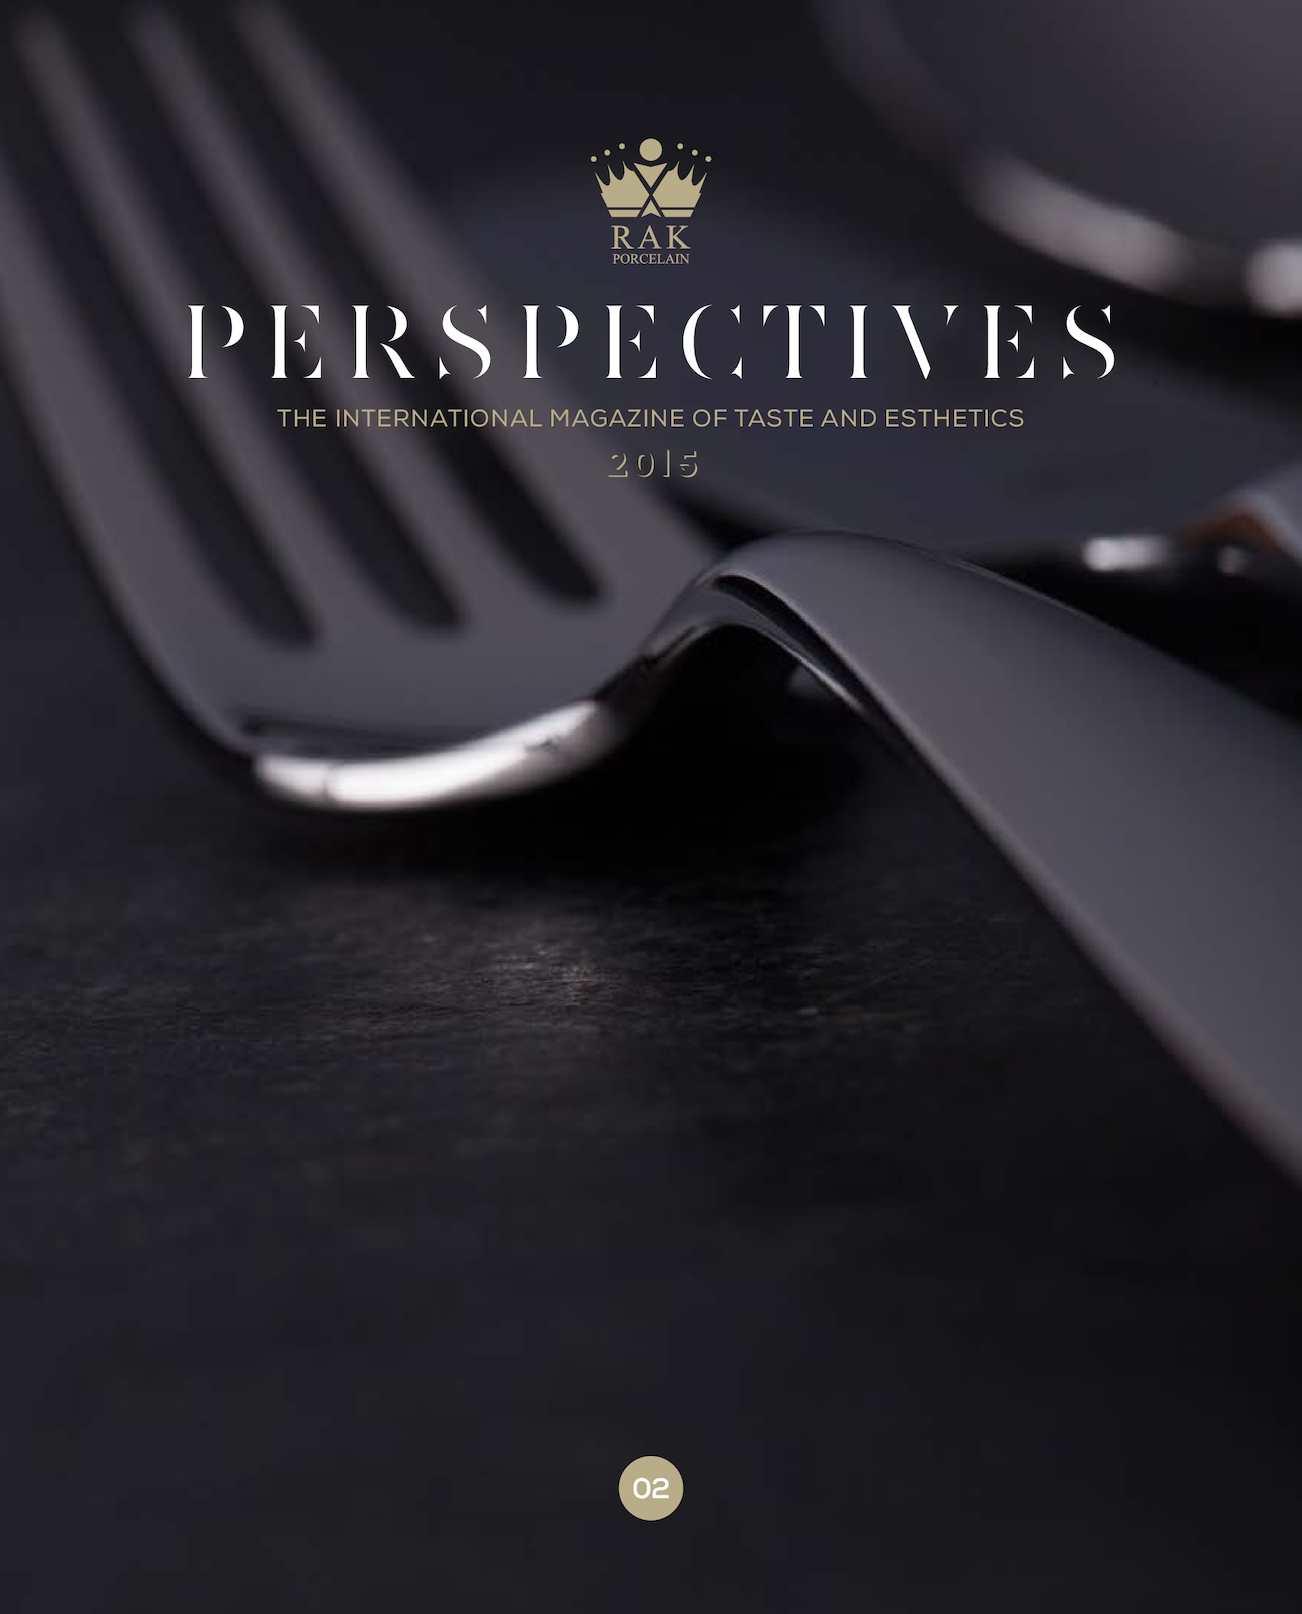 Calaméo - Rak Perspectives 2 En Ld